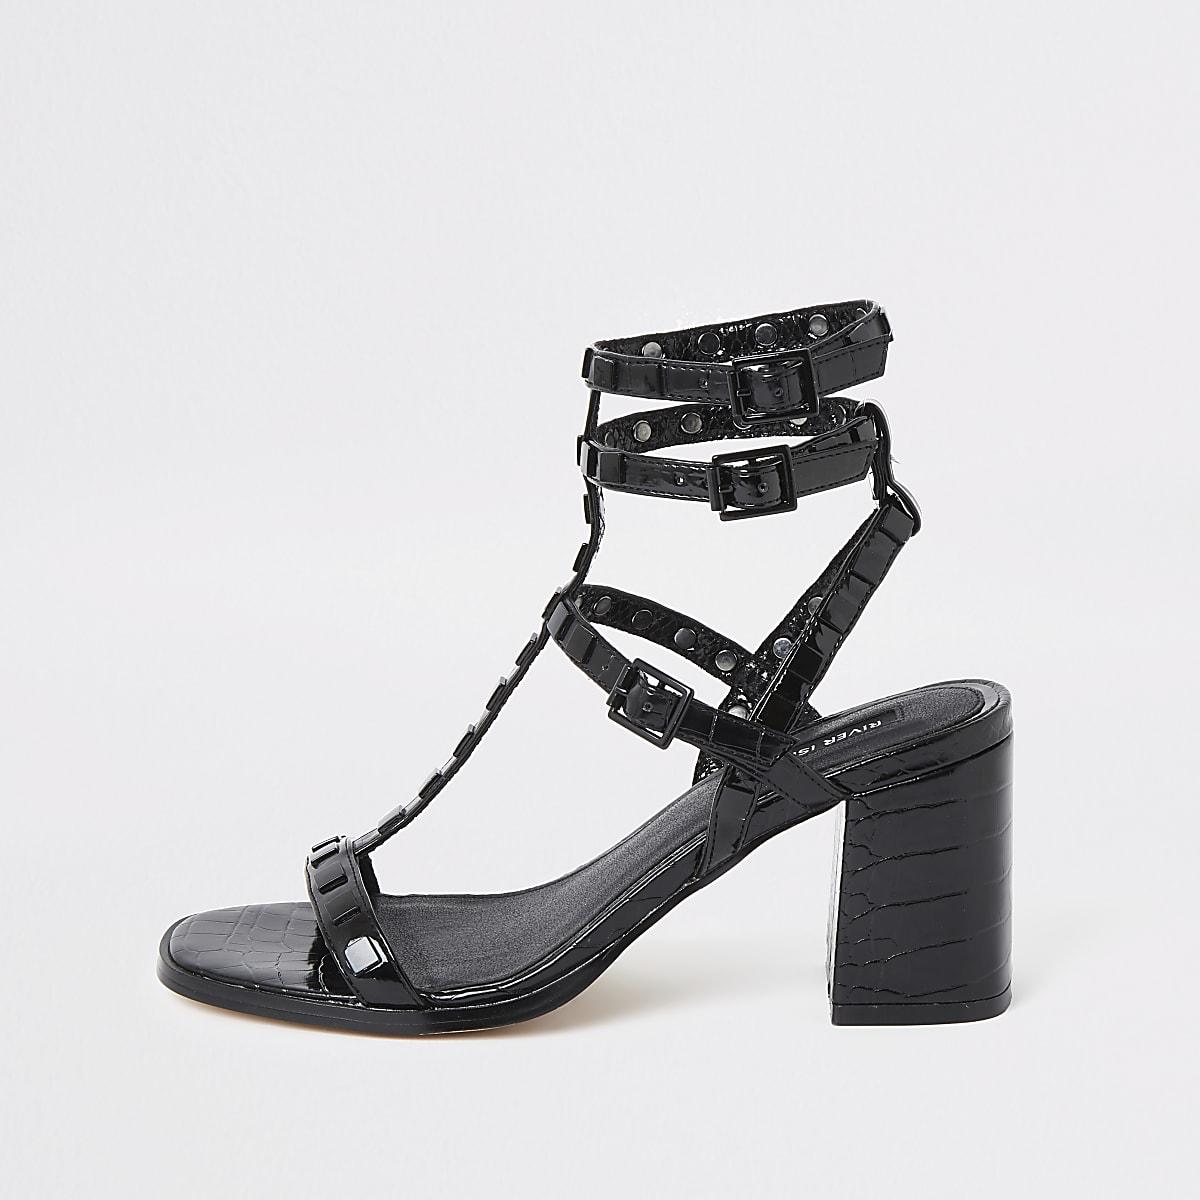 Black studded gladiator block heel sandals